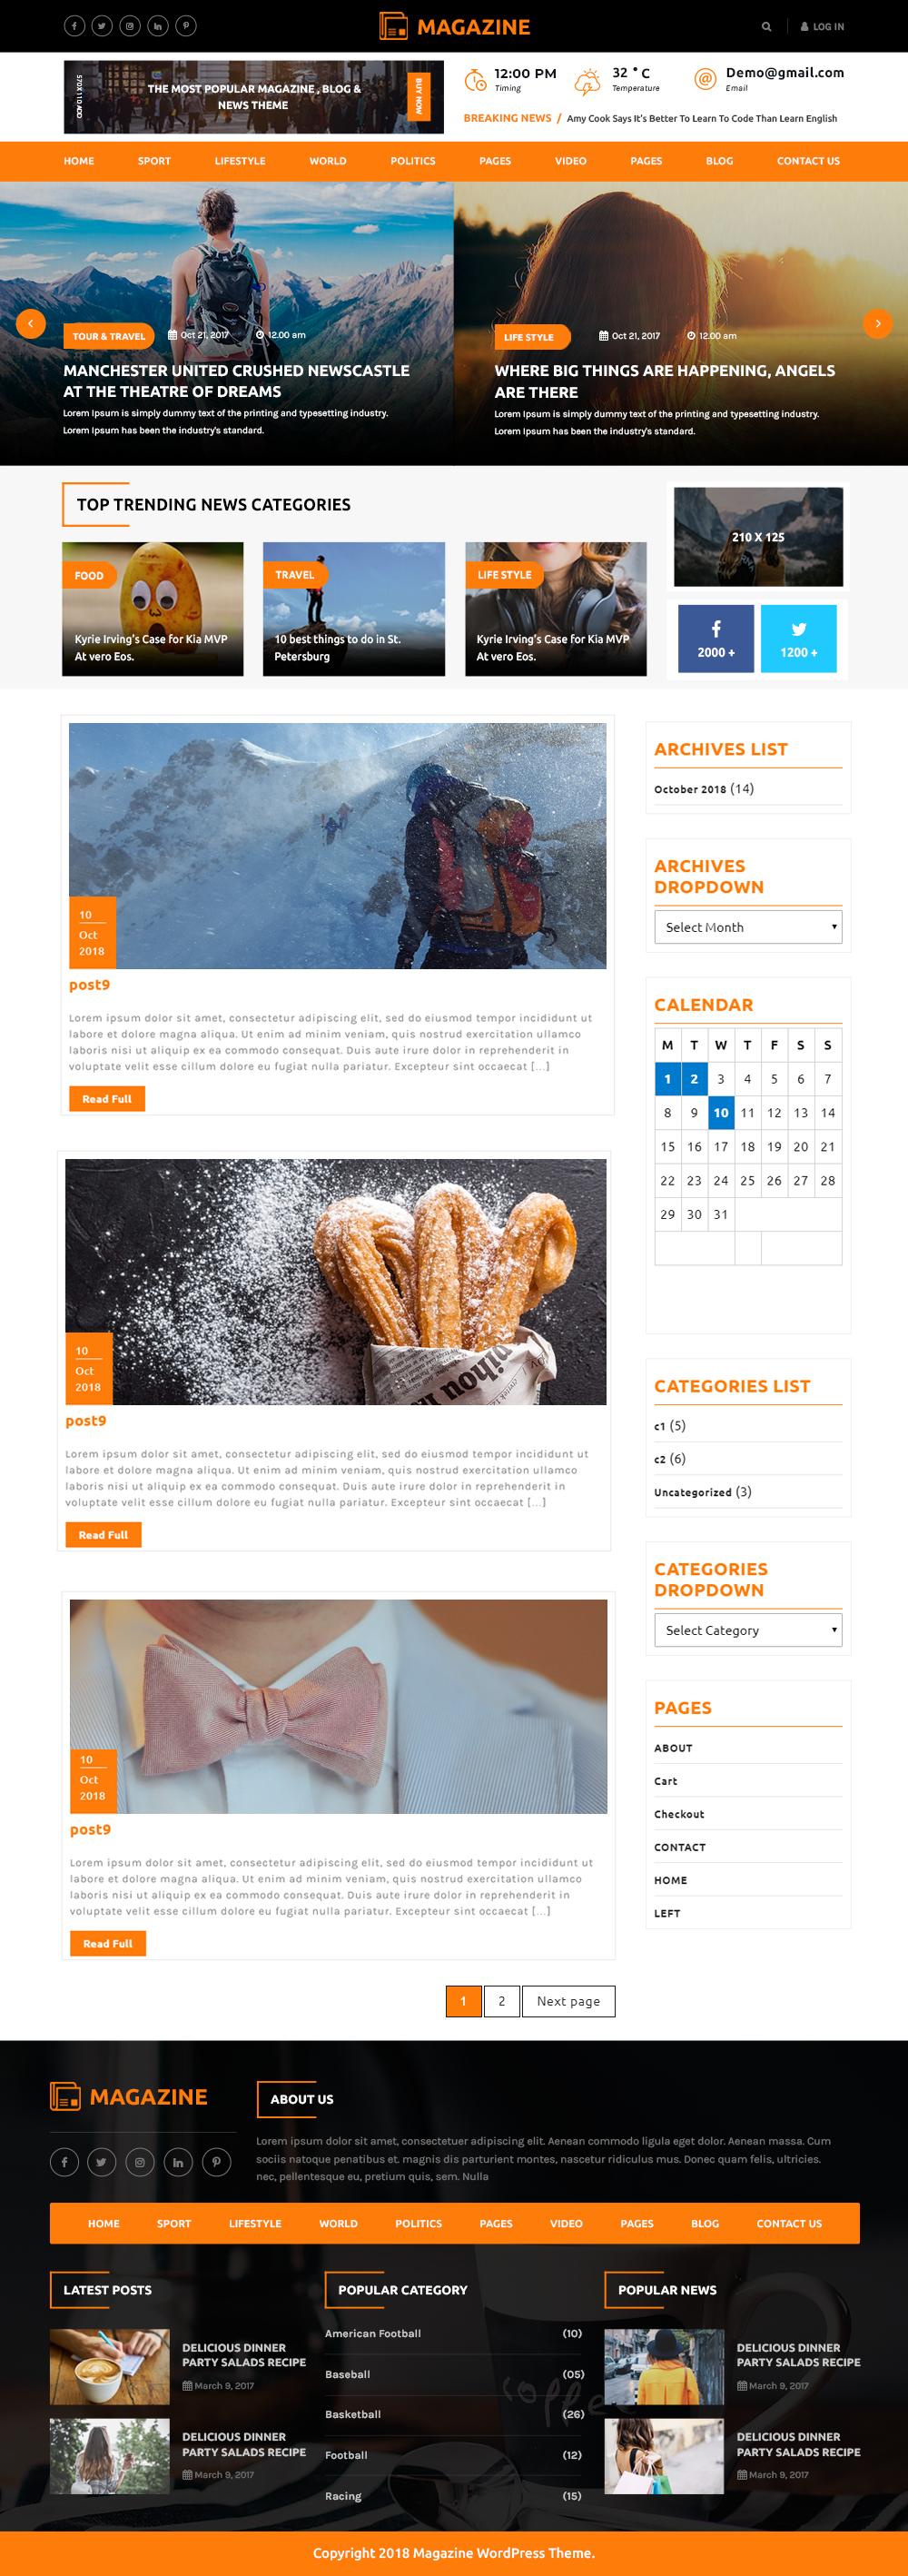 magazine-wordpress-theme-free